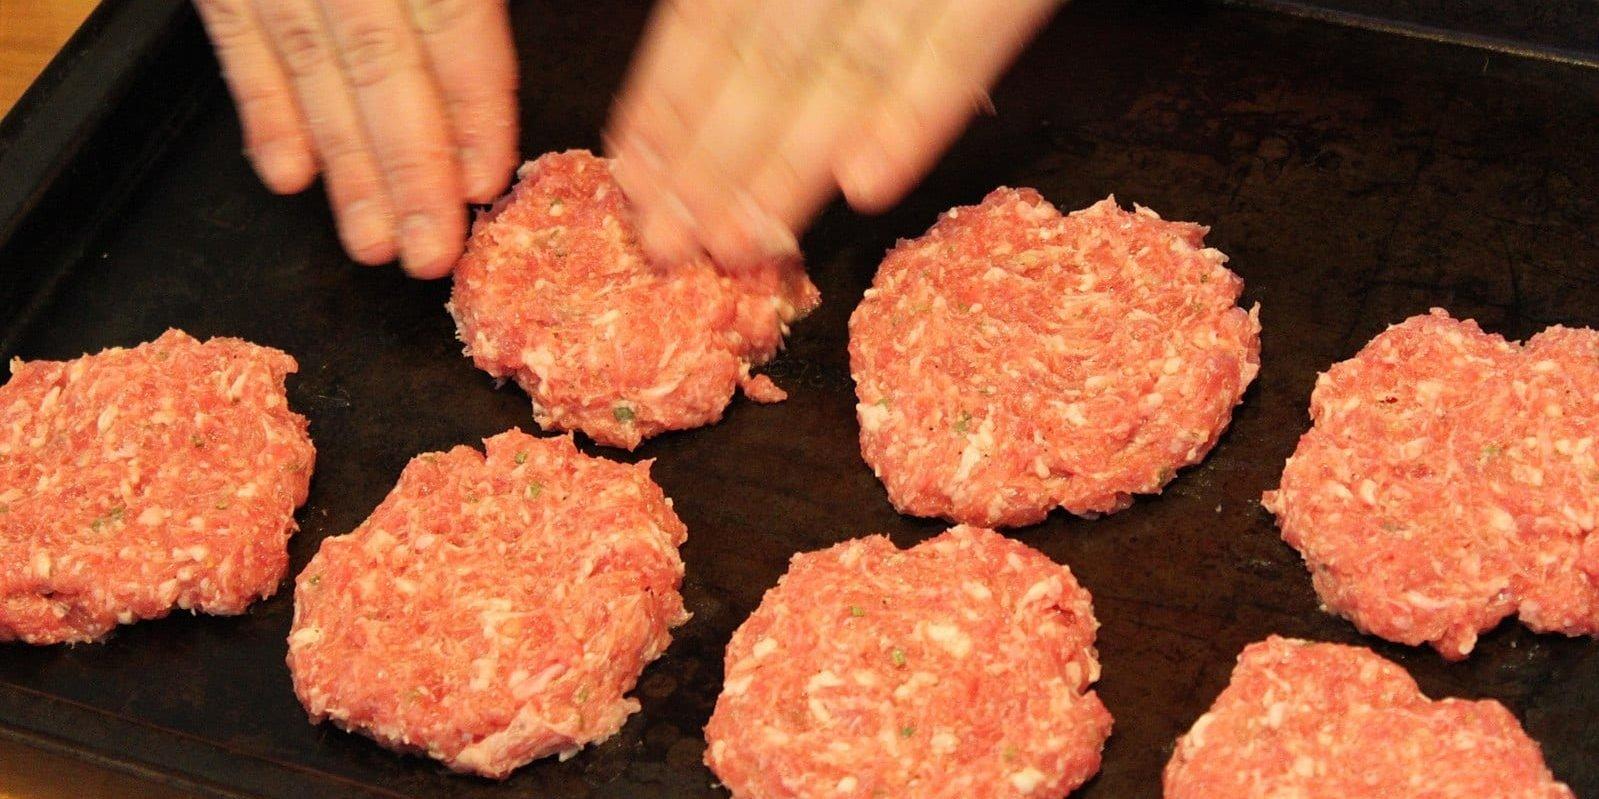 sausage making patties e1558793847579.jpg?resize=1200,630 - Timeless Recipes That Will Always Taste Like Heaven